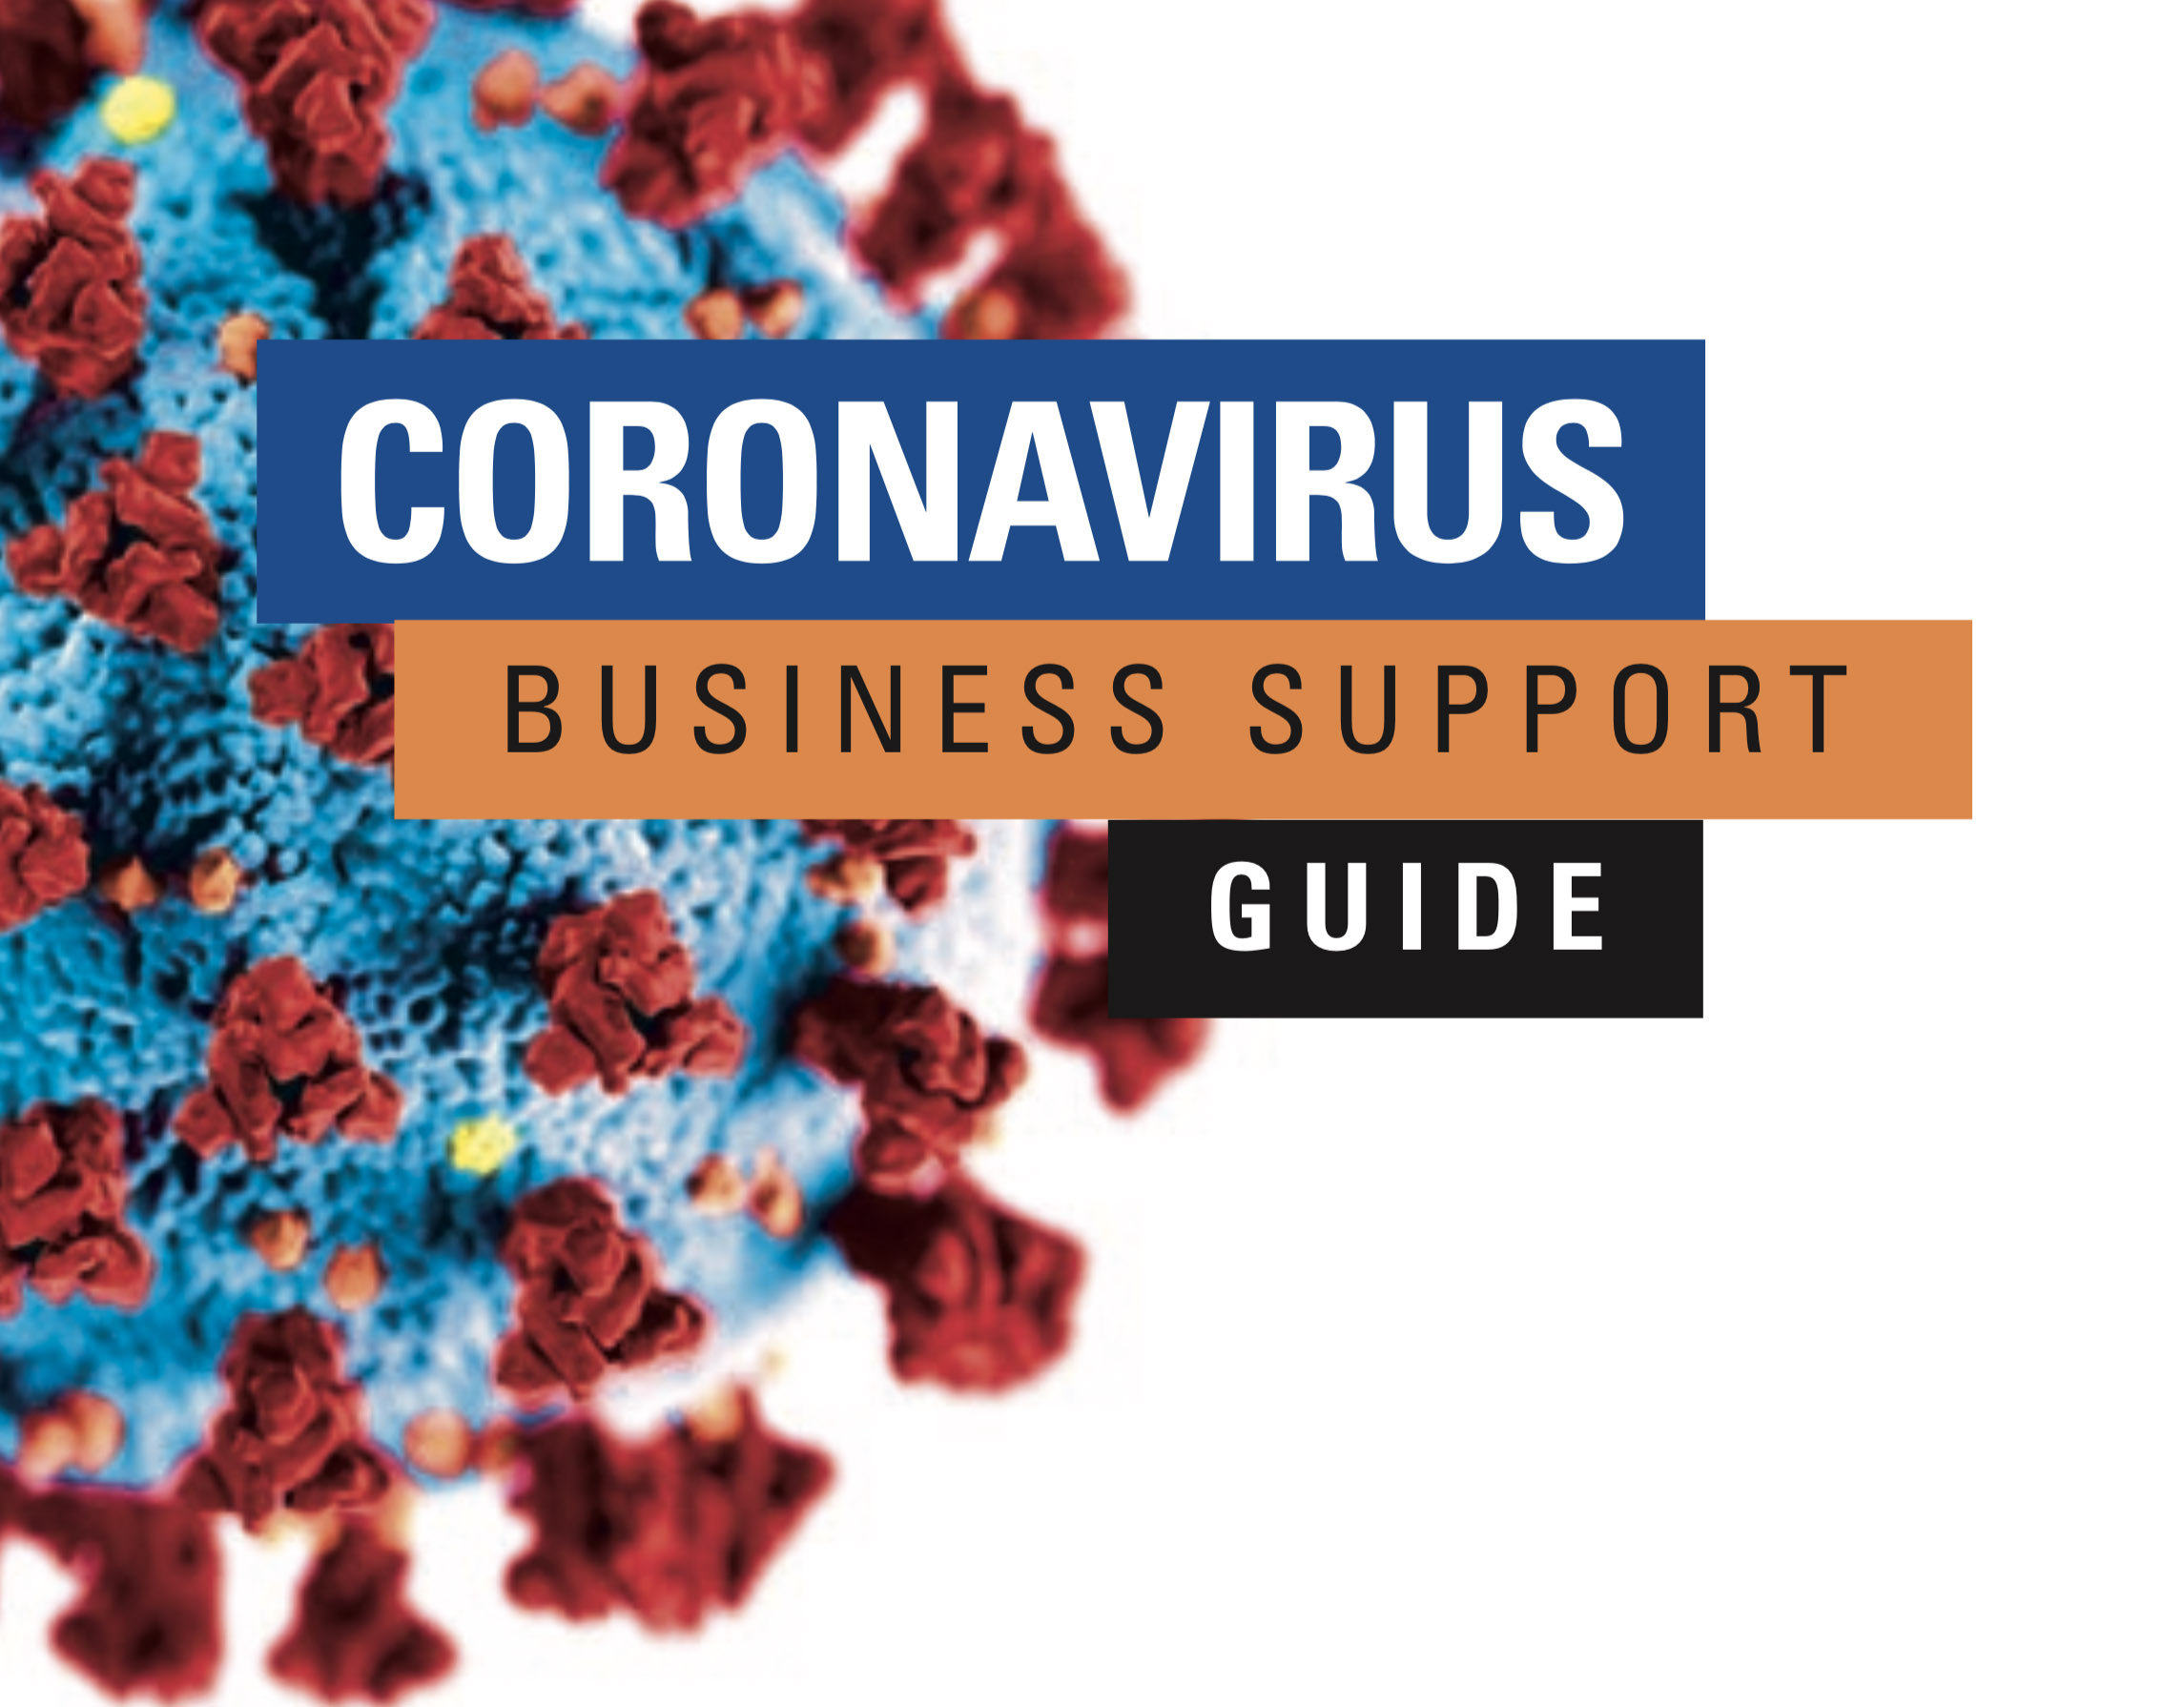 ADPL - Coronavirus Business Support Guide